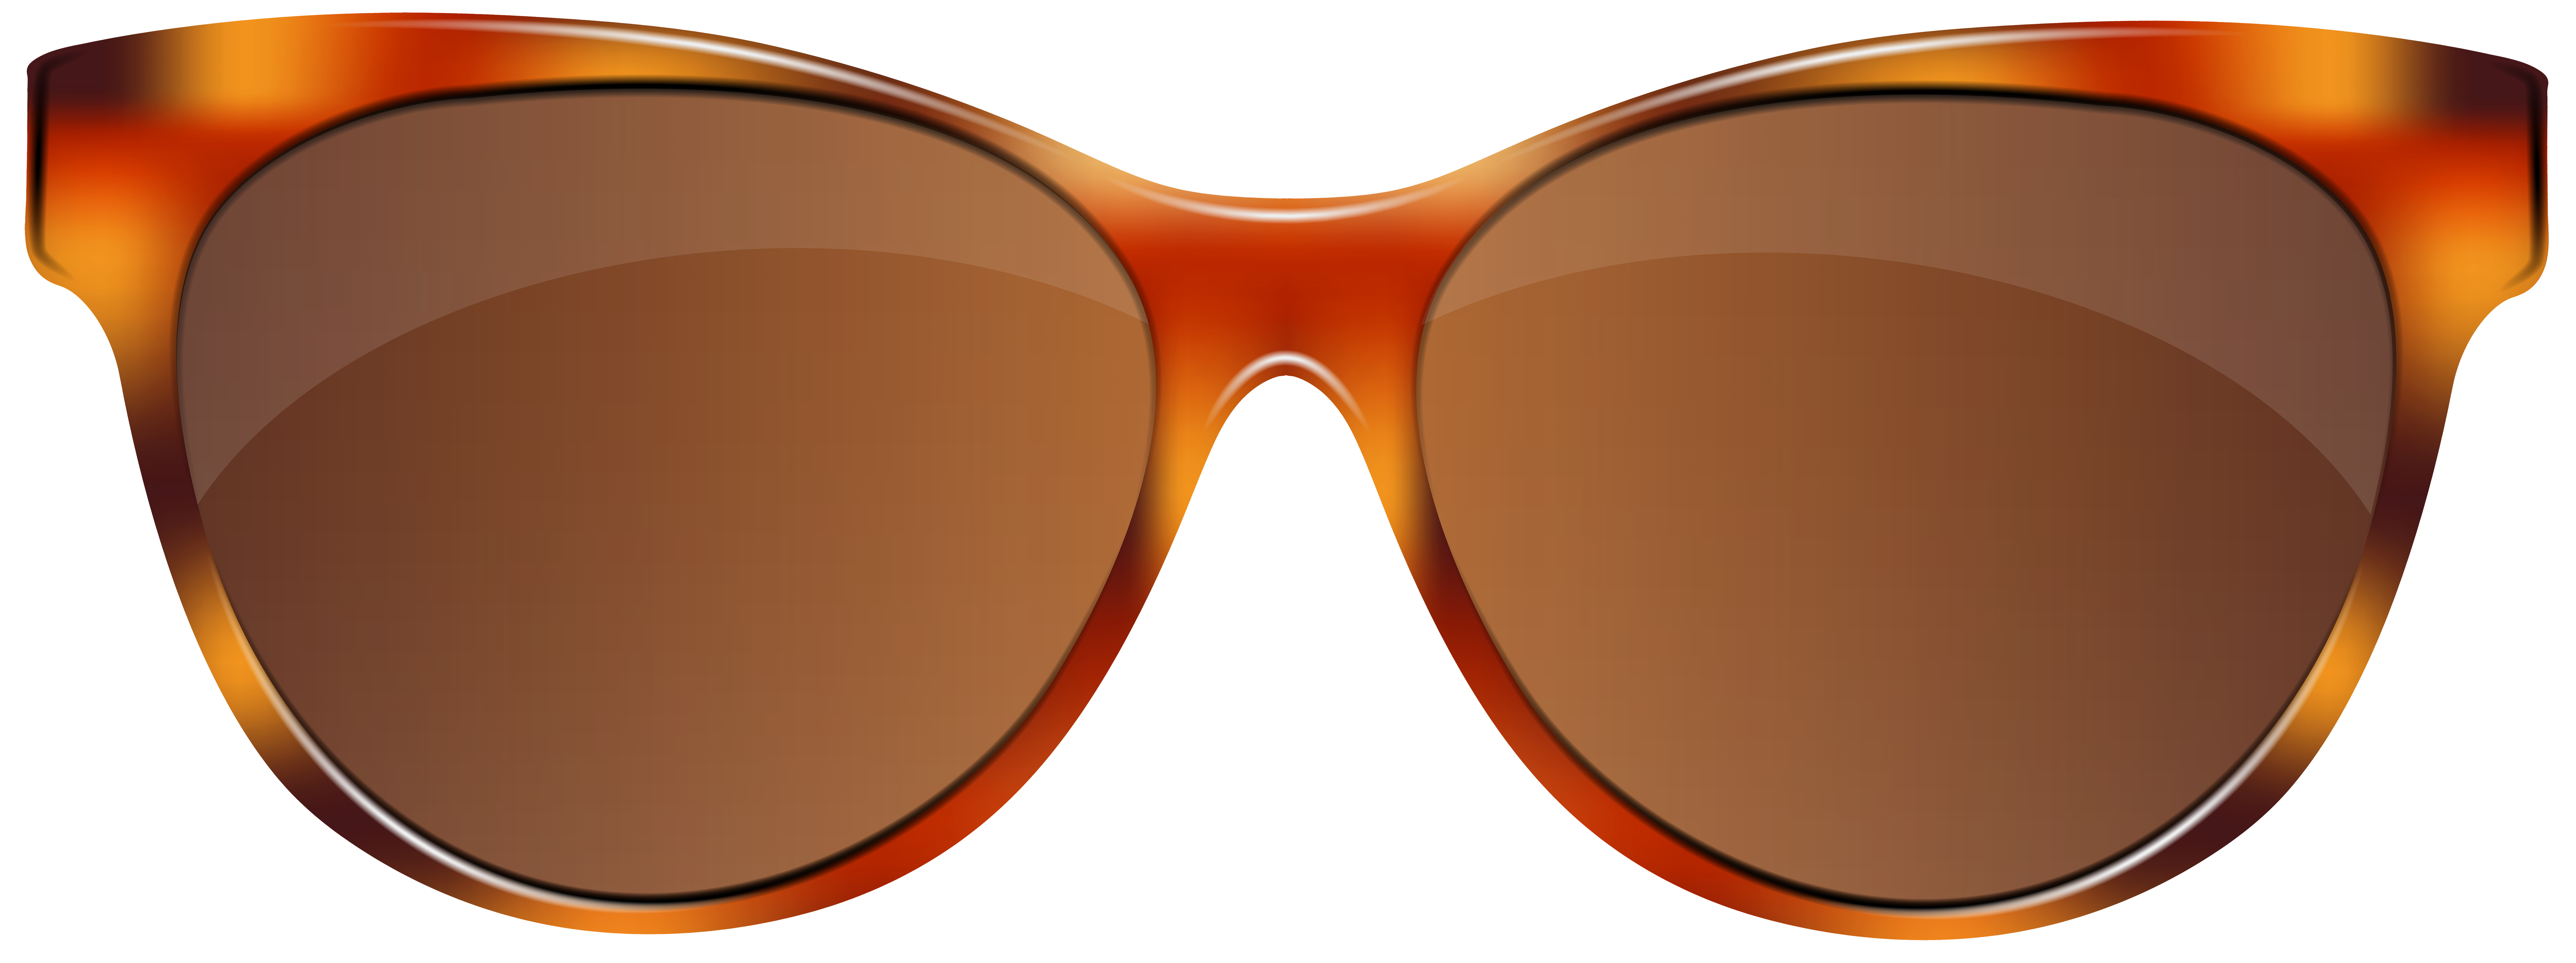 Sunglasses clipart brown. Png clip art image